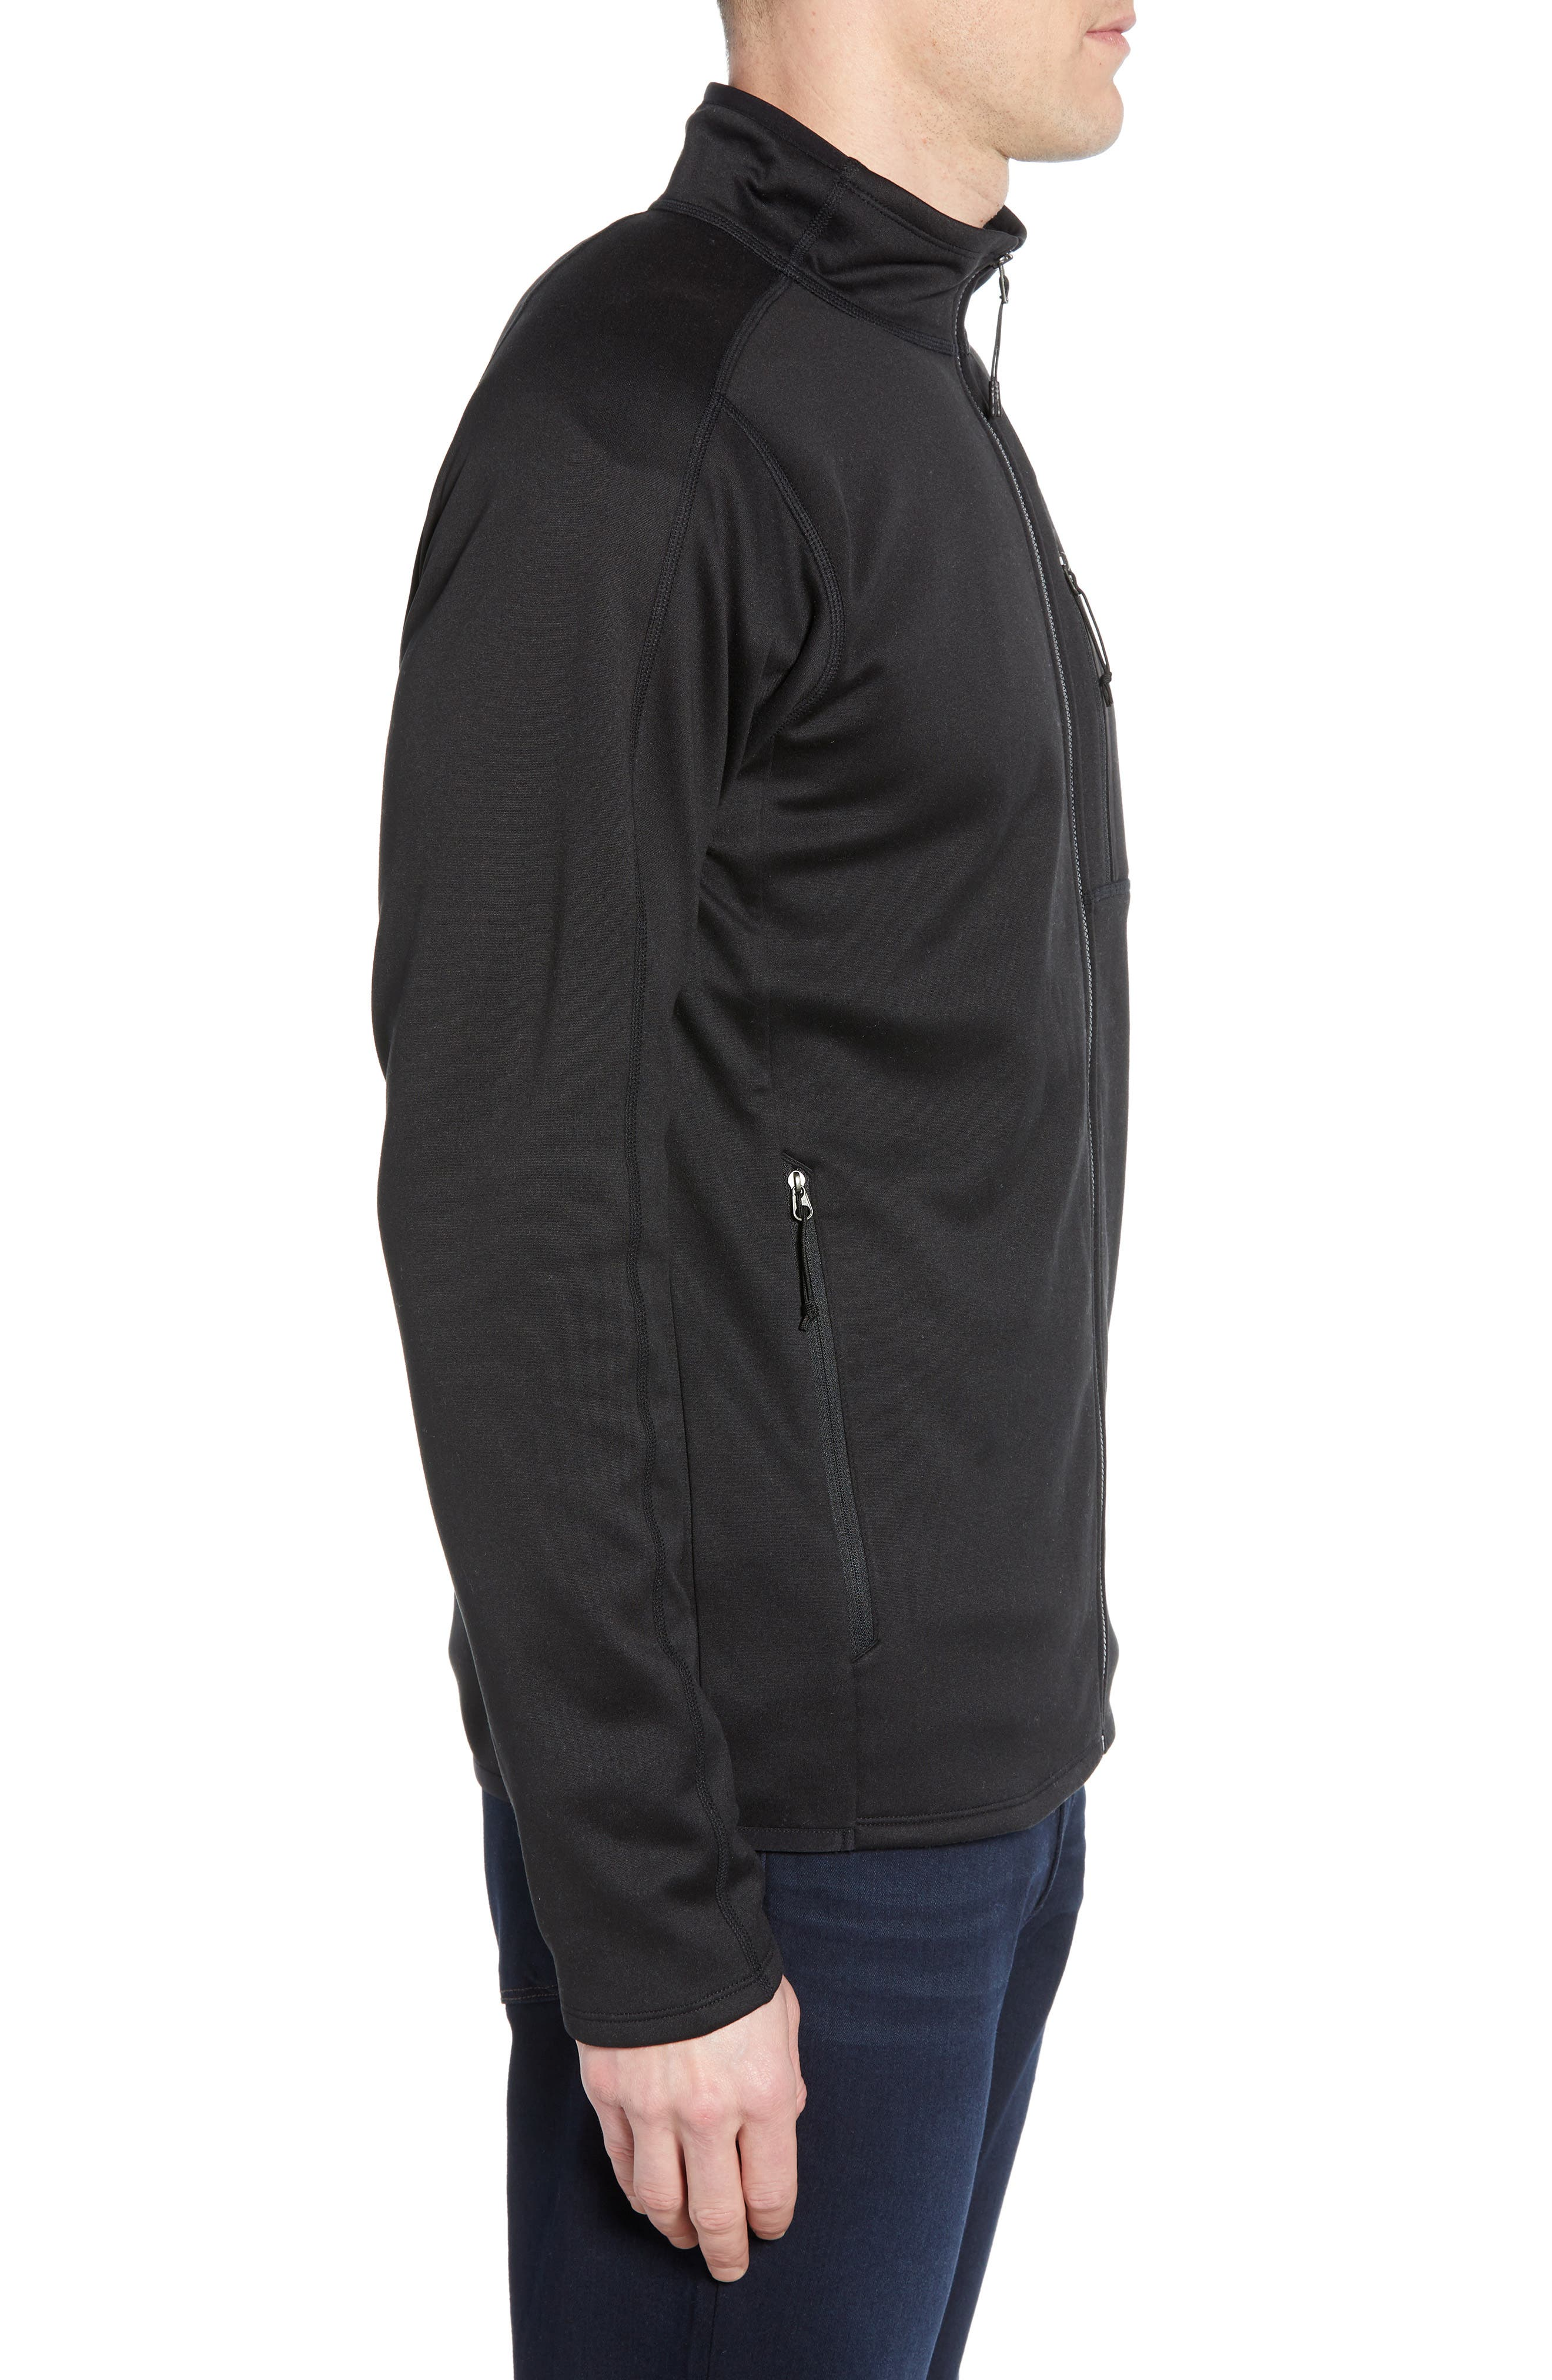 THE NORTH FACE,                             Canyonlands Zip Jacket,                             Alternate thumbnail 3, color,                             TNF BLACK